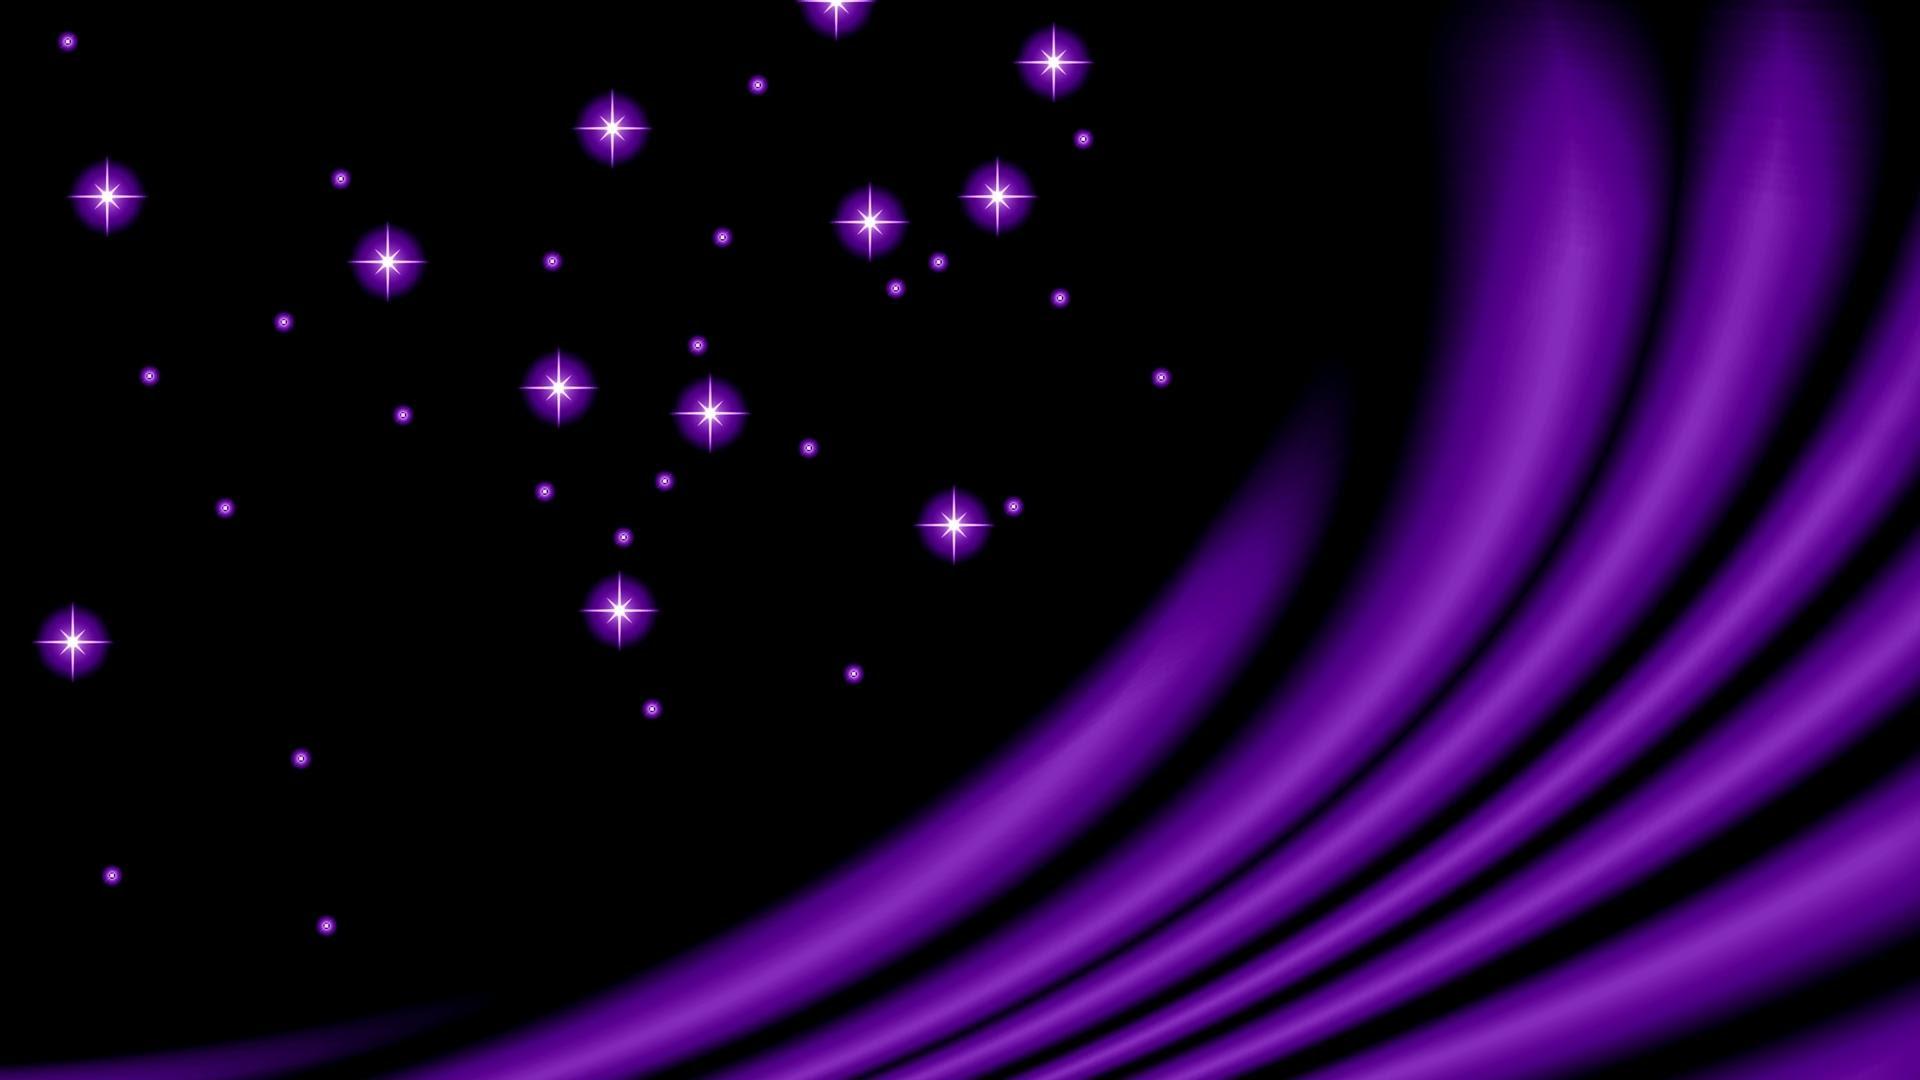 Bintang Ungu Hd Wallpaper Desktop Lebar Definisi Tinggi Fullscreen